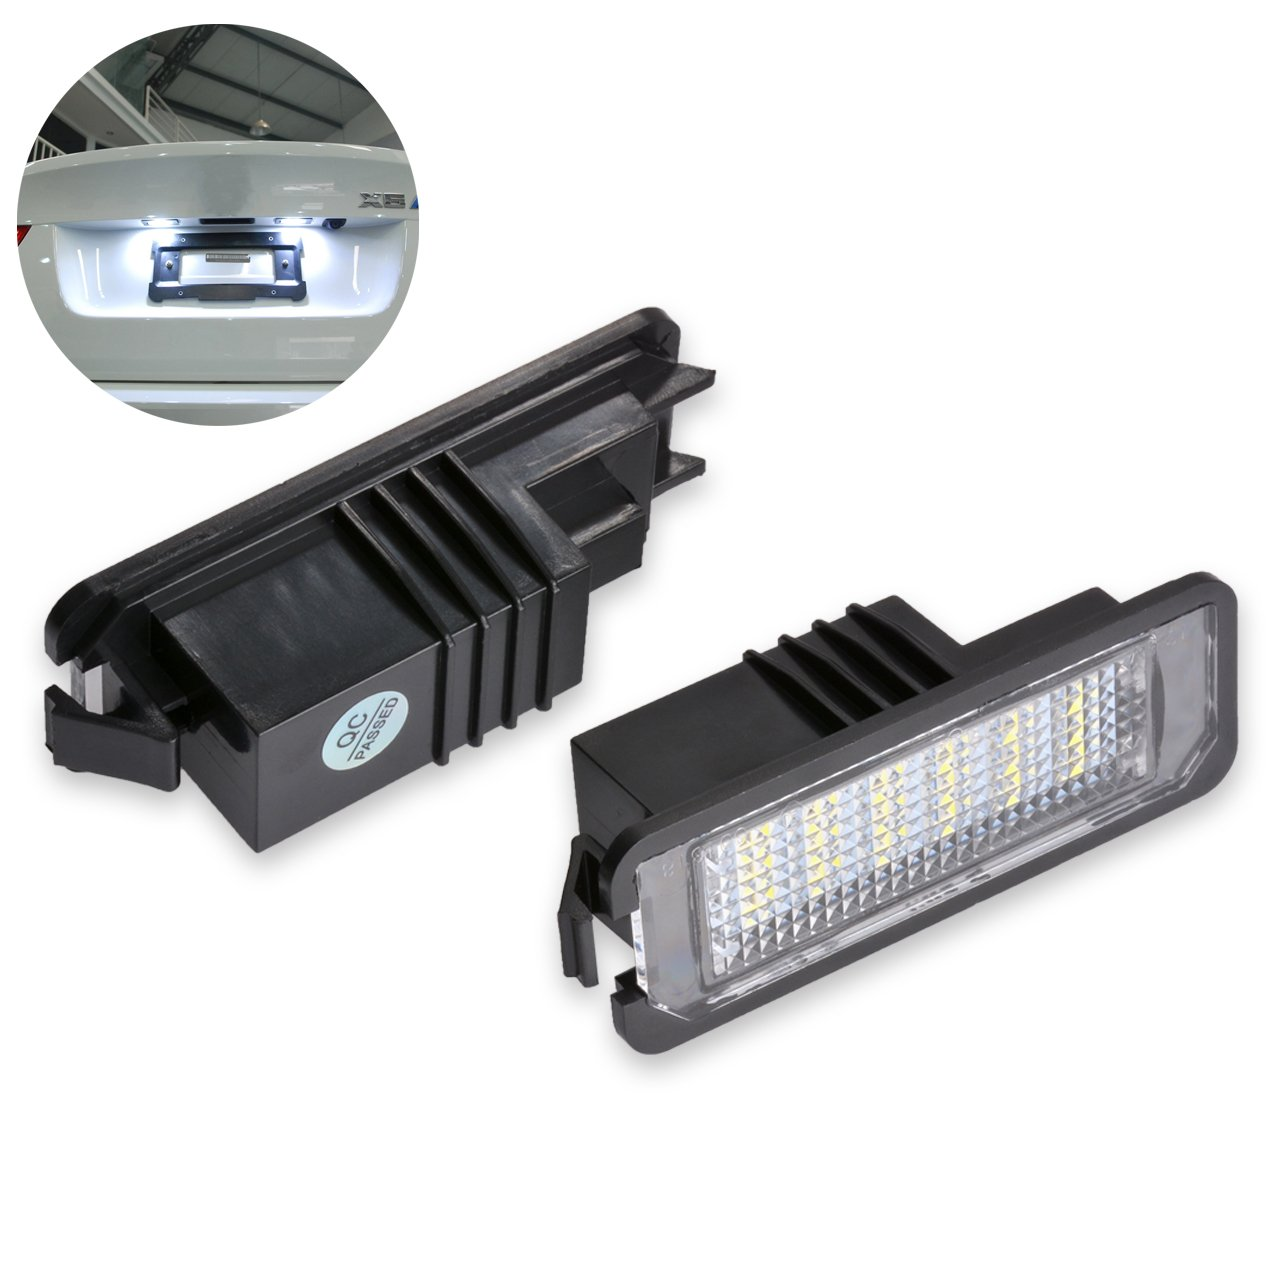 NGCAT lampadine a 18 LED 3528 SMD per targa adatte a sistemi CanBus confezione da 2 pezzi